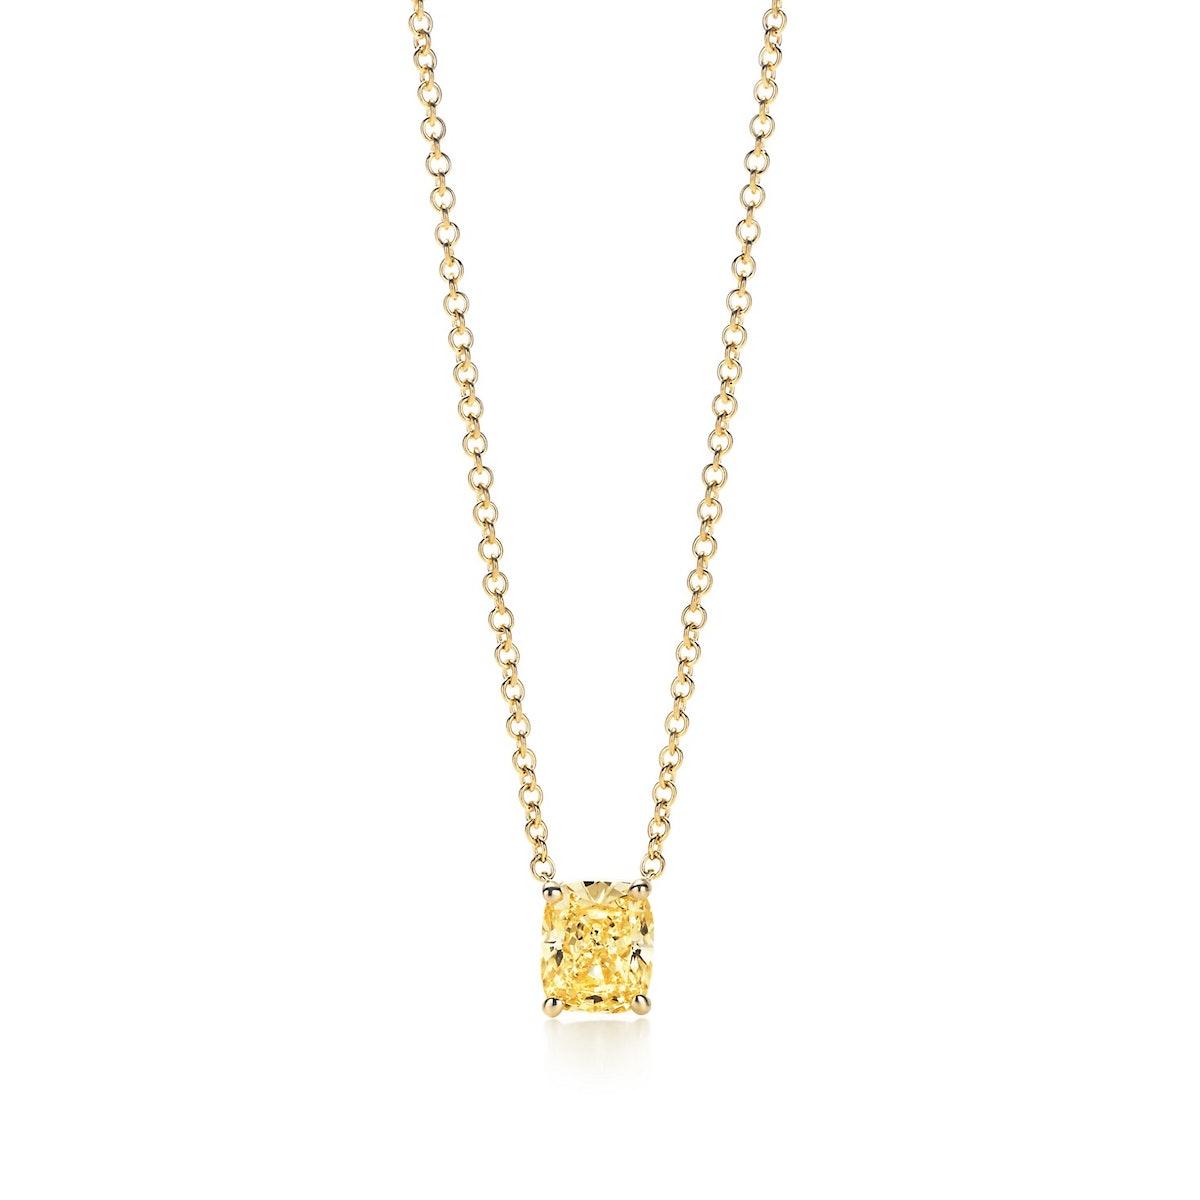 Tiffany & Co. Cushion-Cut Yellow Diamond Pendant